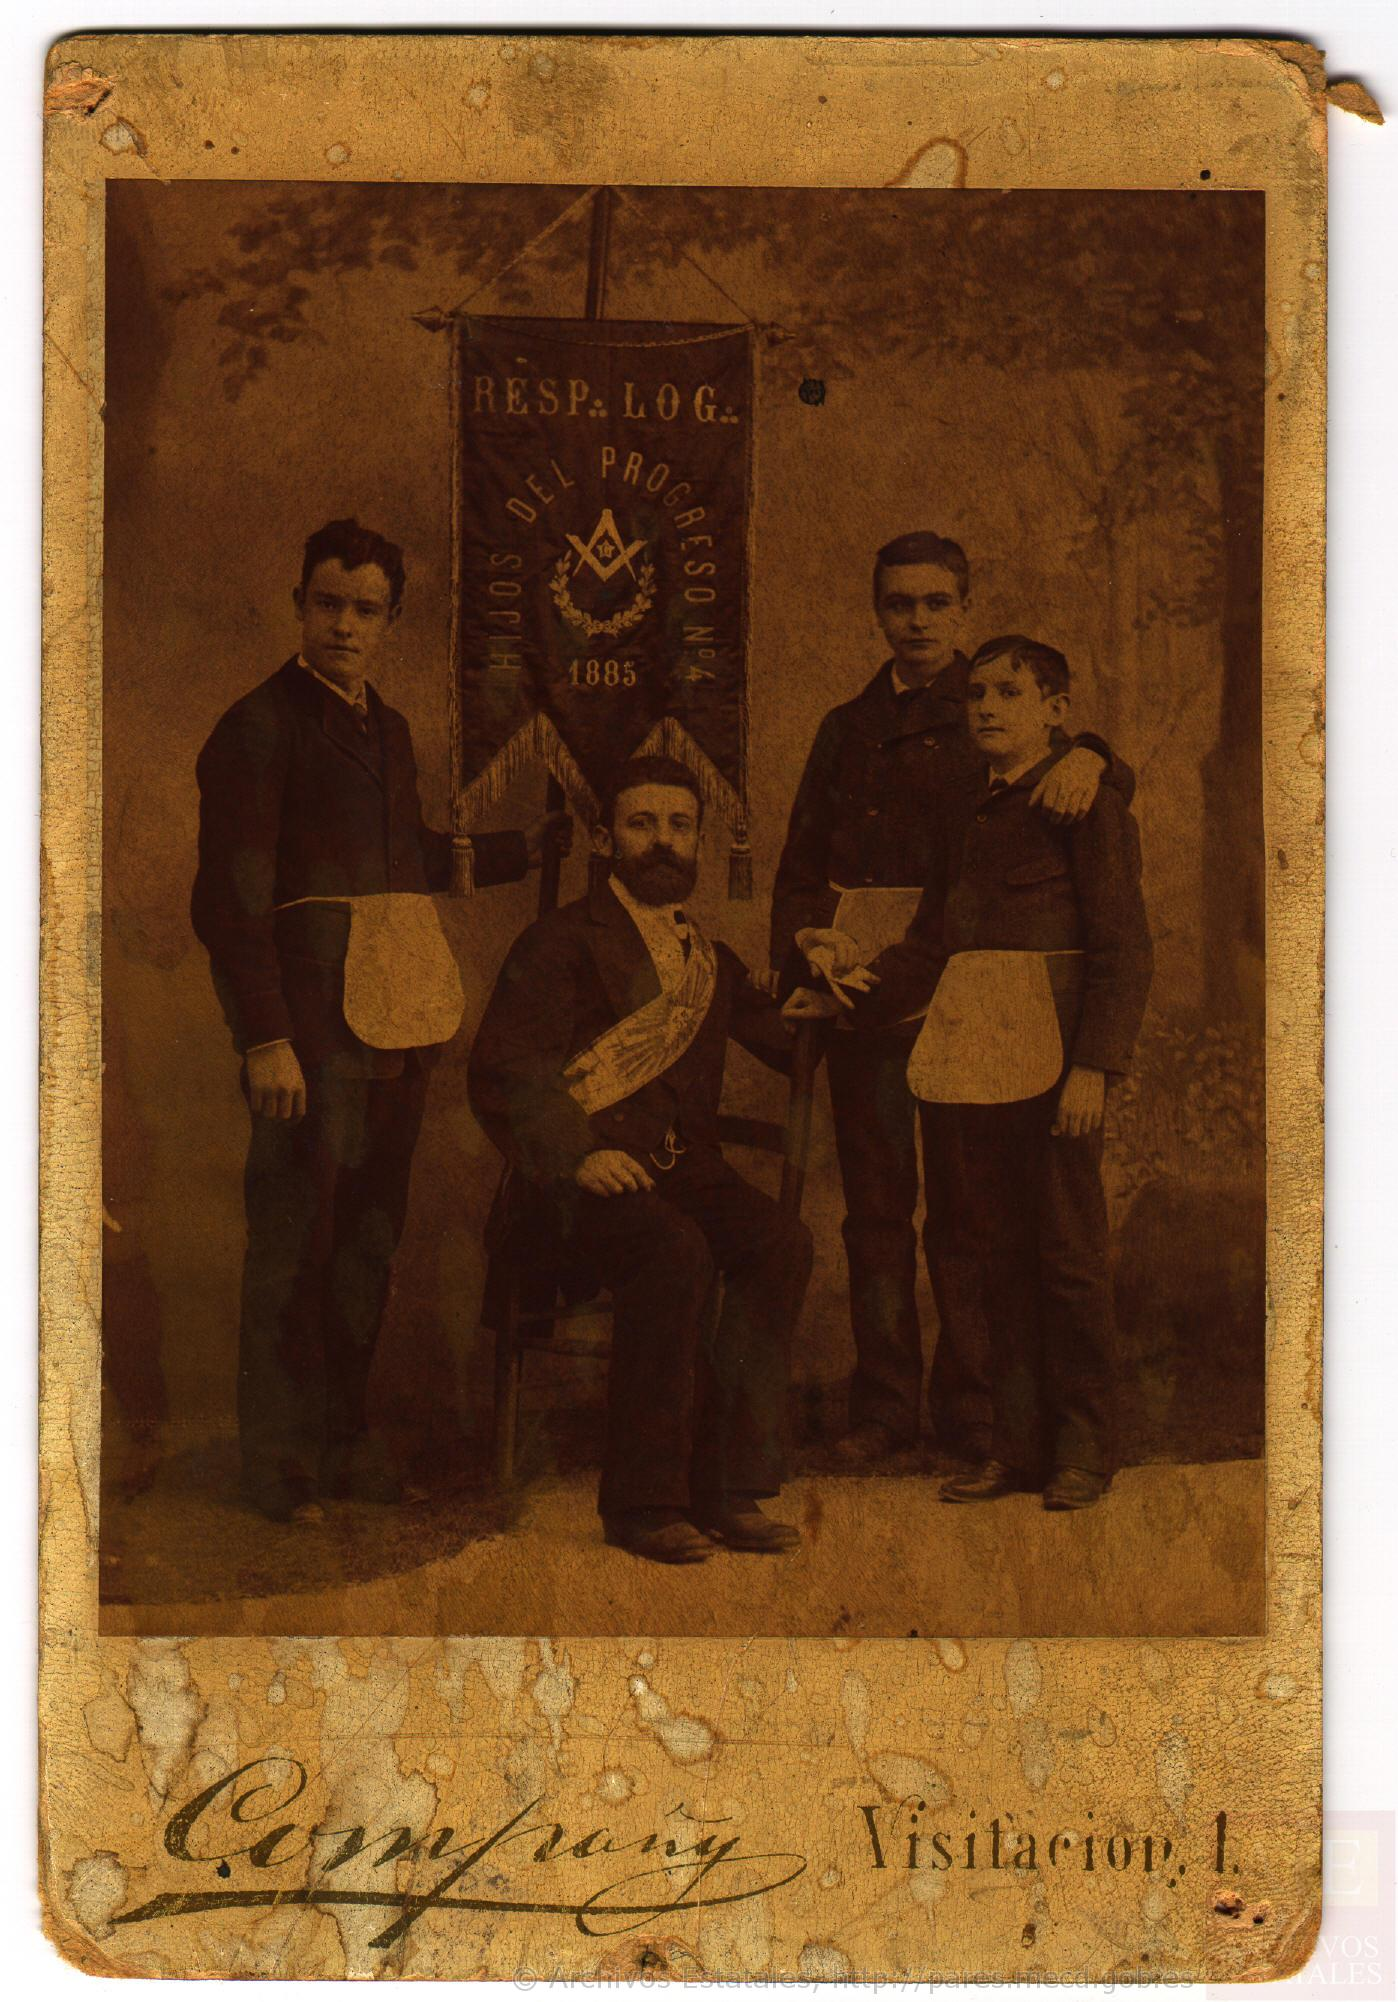 Logia Hijos del Progreso (1885)